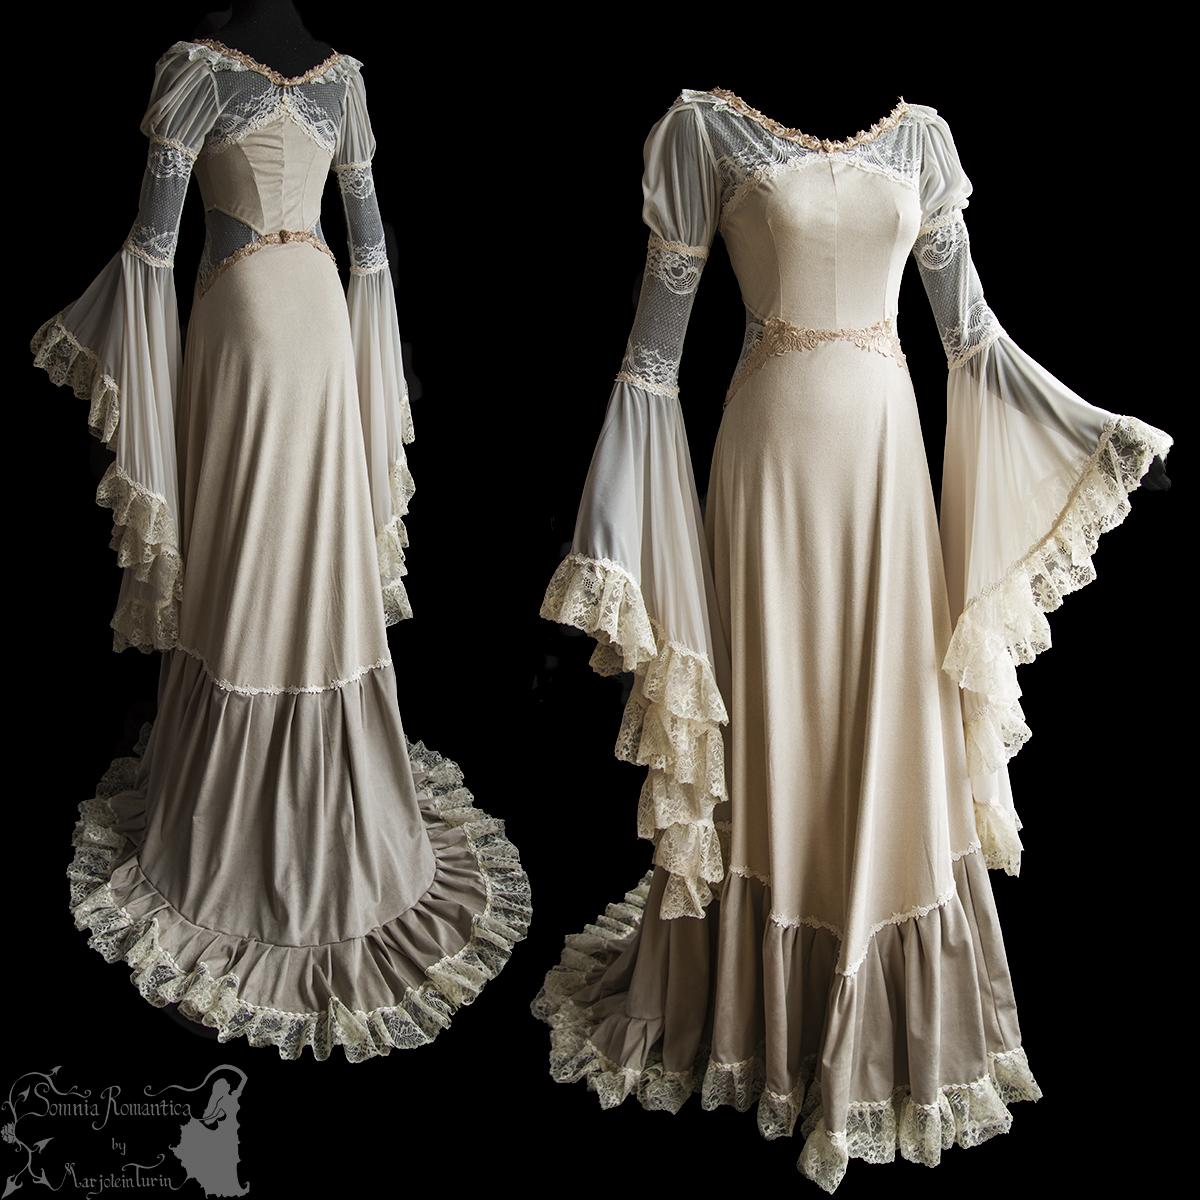 nimbata-manes-dress-couture-2016-10-okt-14-social.jpg